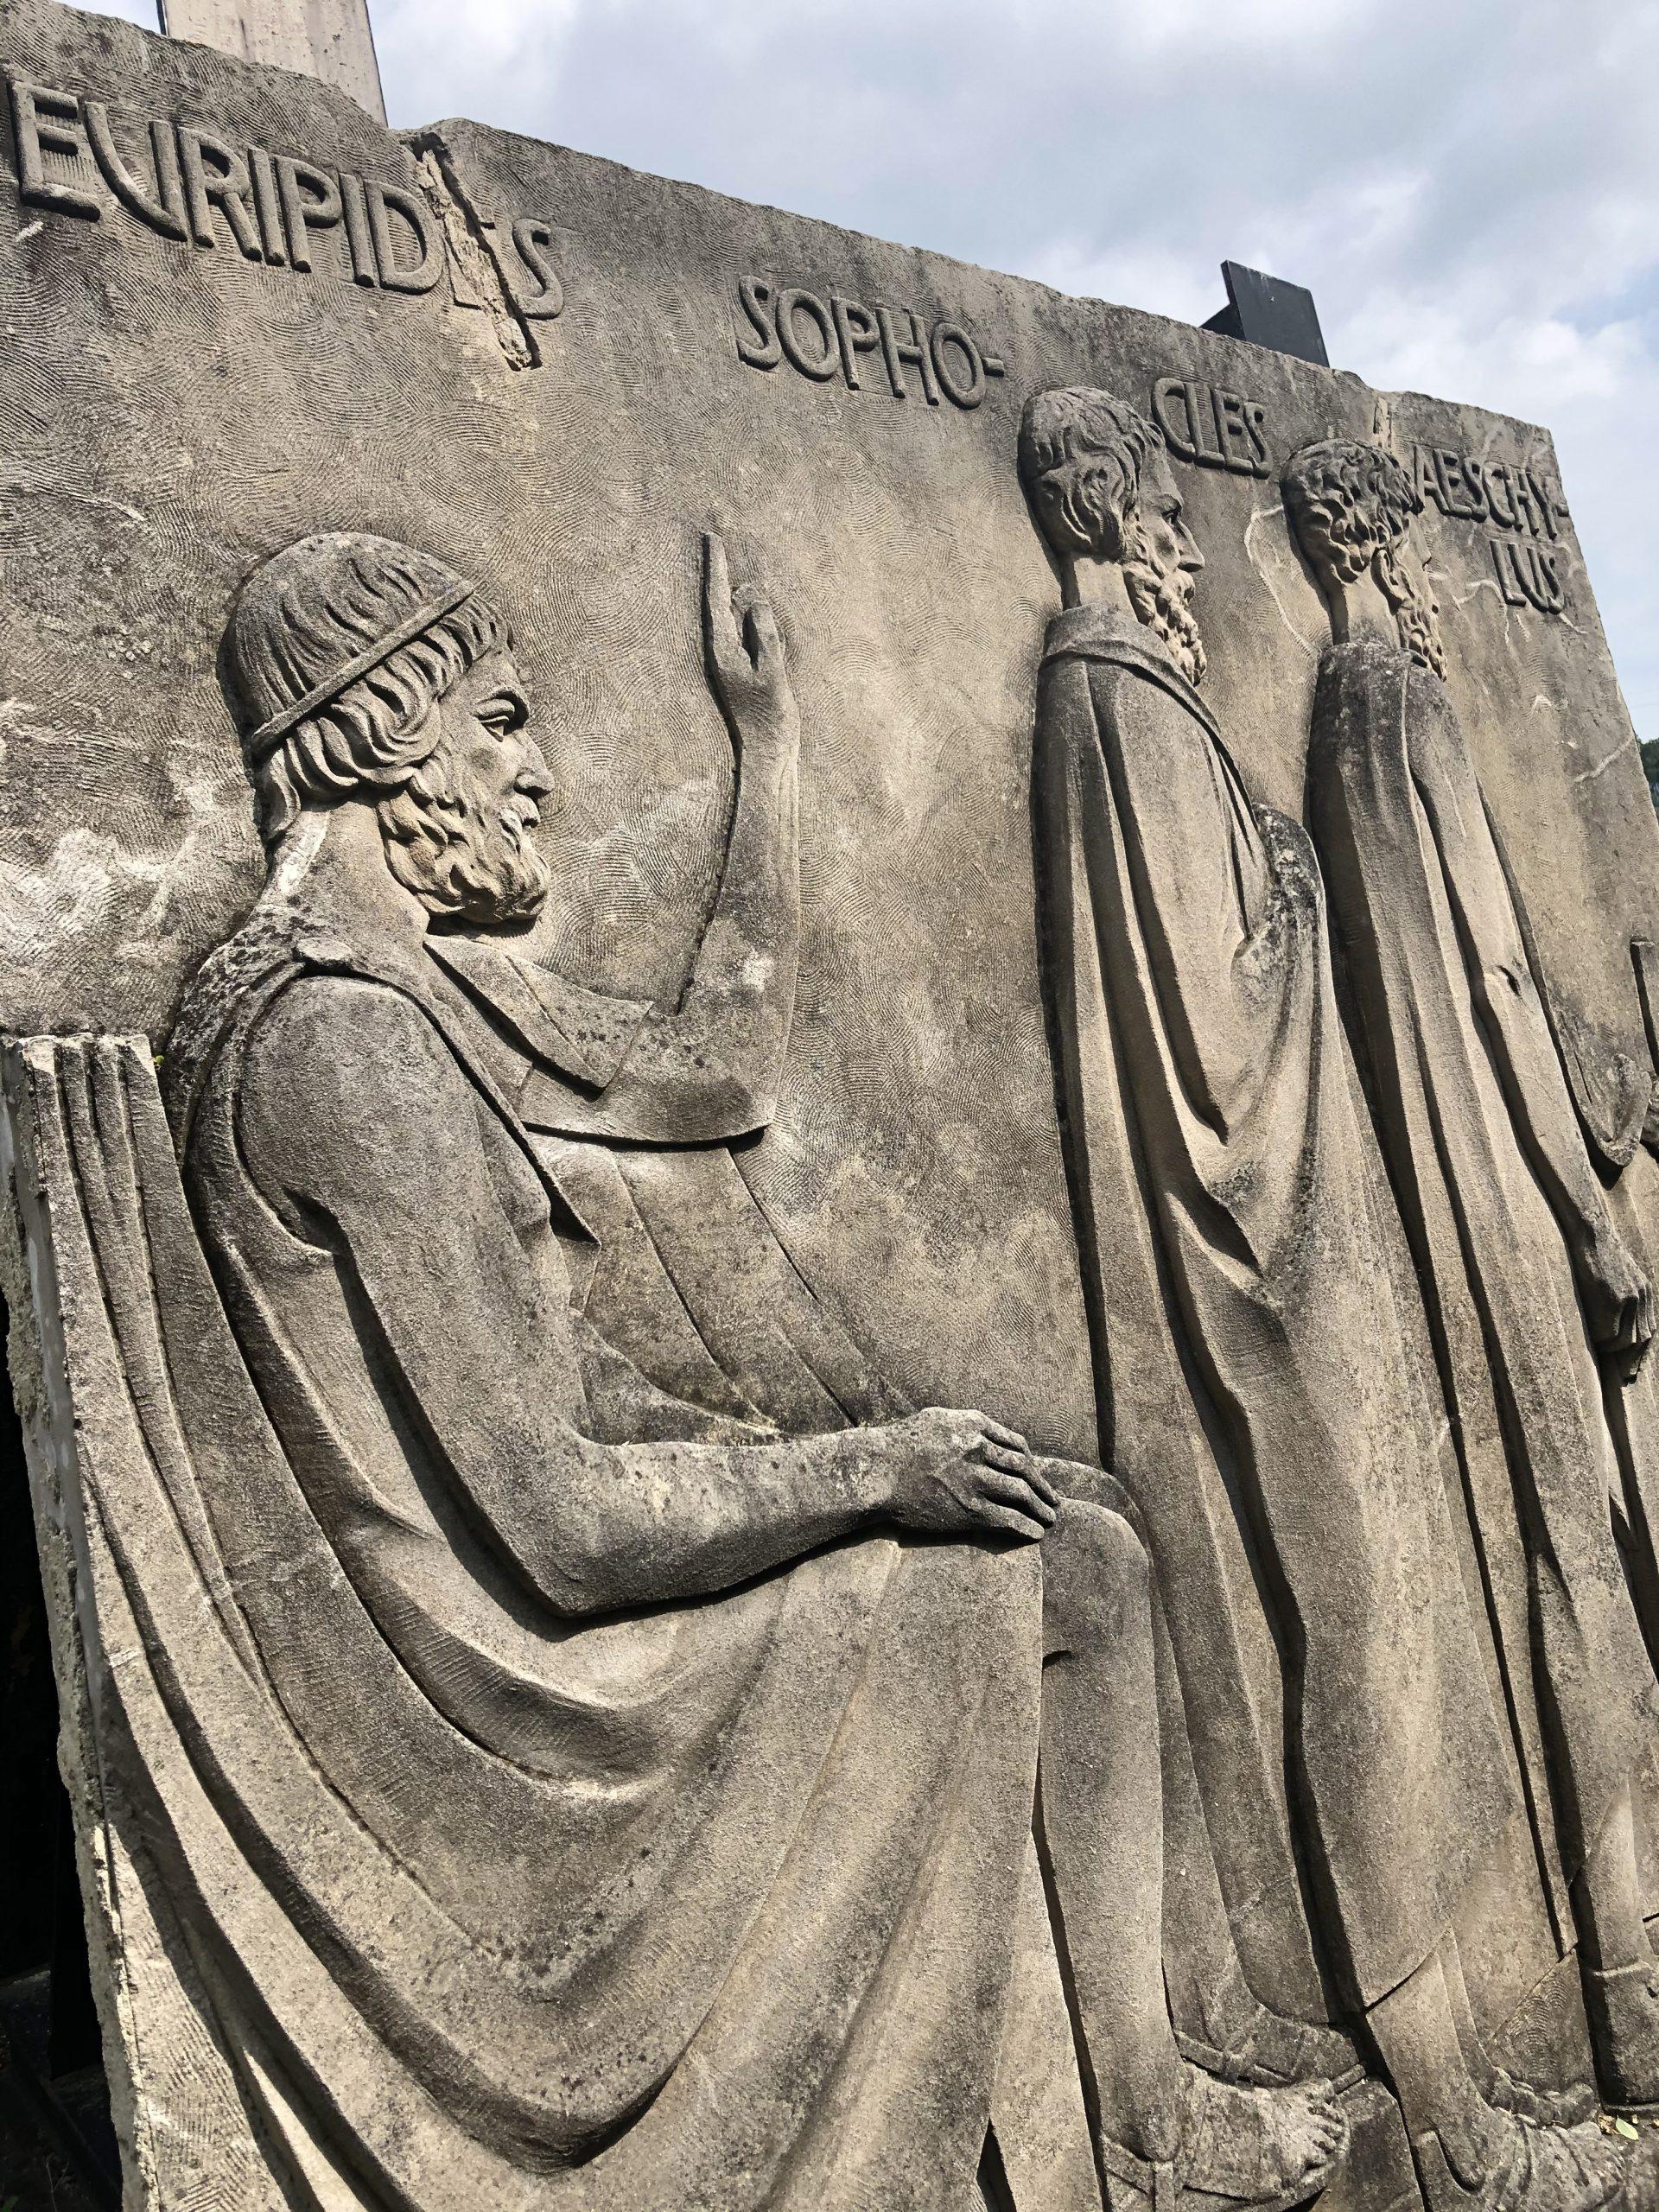 fishwick relief with euripides, sophocoles